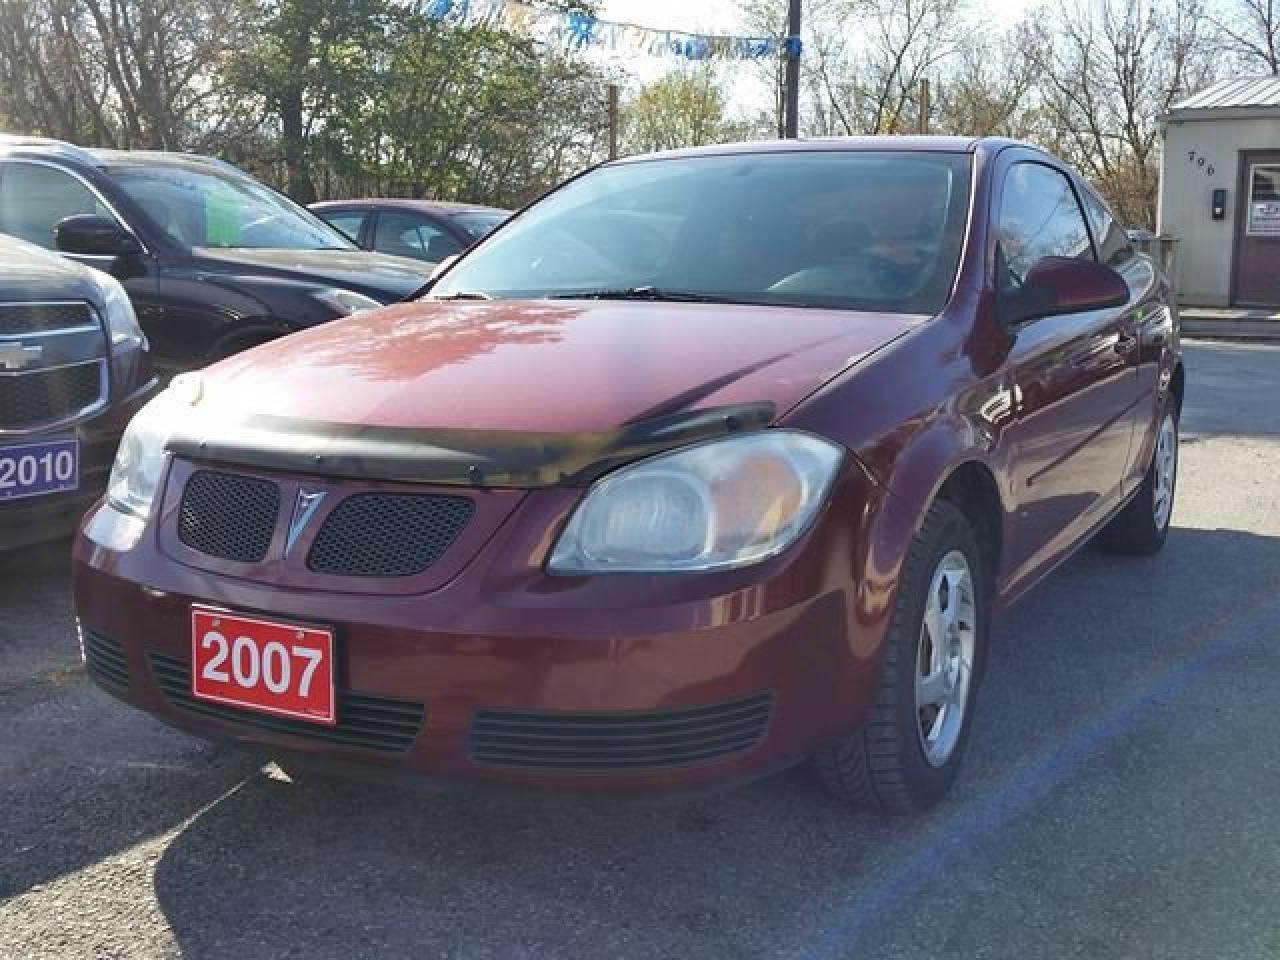 Photo of Red 2007 Pontiac G5